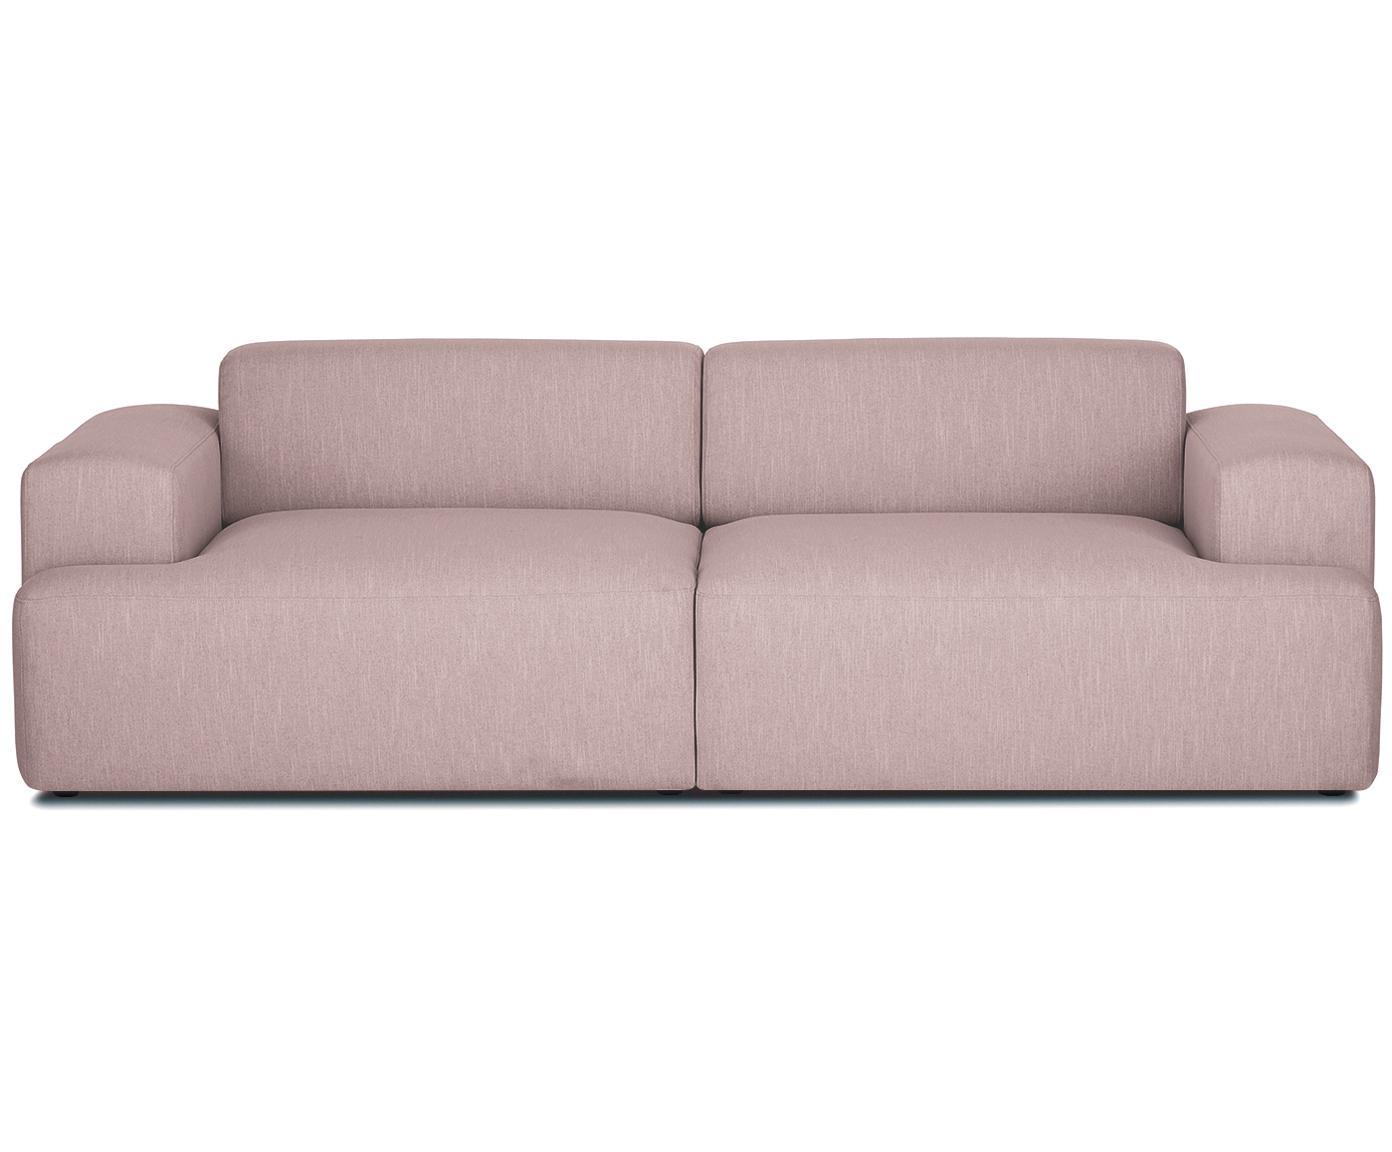 Bank Melva (3-zits), Bekleding: polyester, Frame: massief grenenhout, spaan, Poten: grenenhout, Geweven stof roze, B 240 x D 101 cm